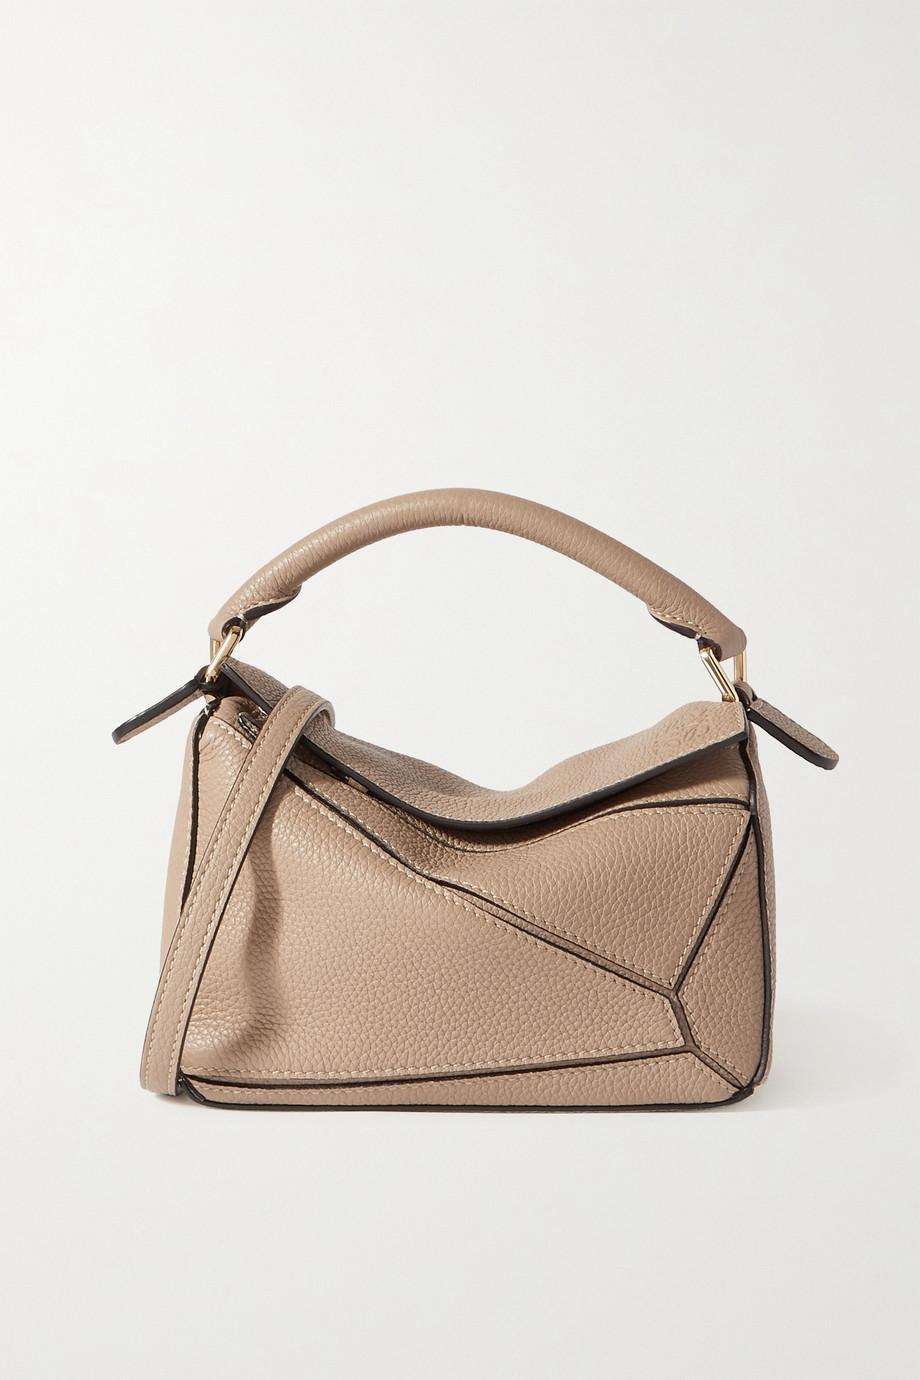 Loewe Puzzle mini textured-leather shoulder bag